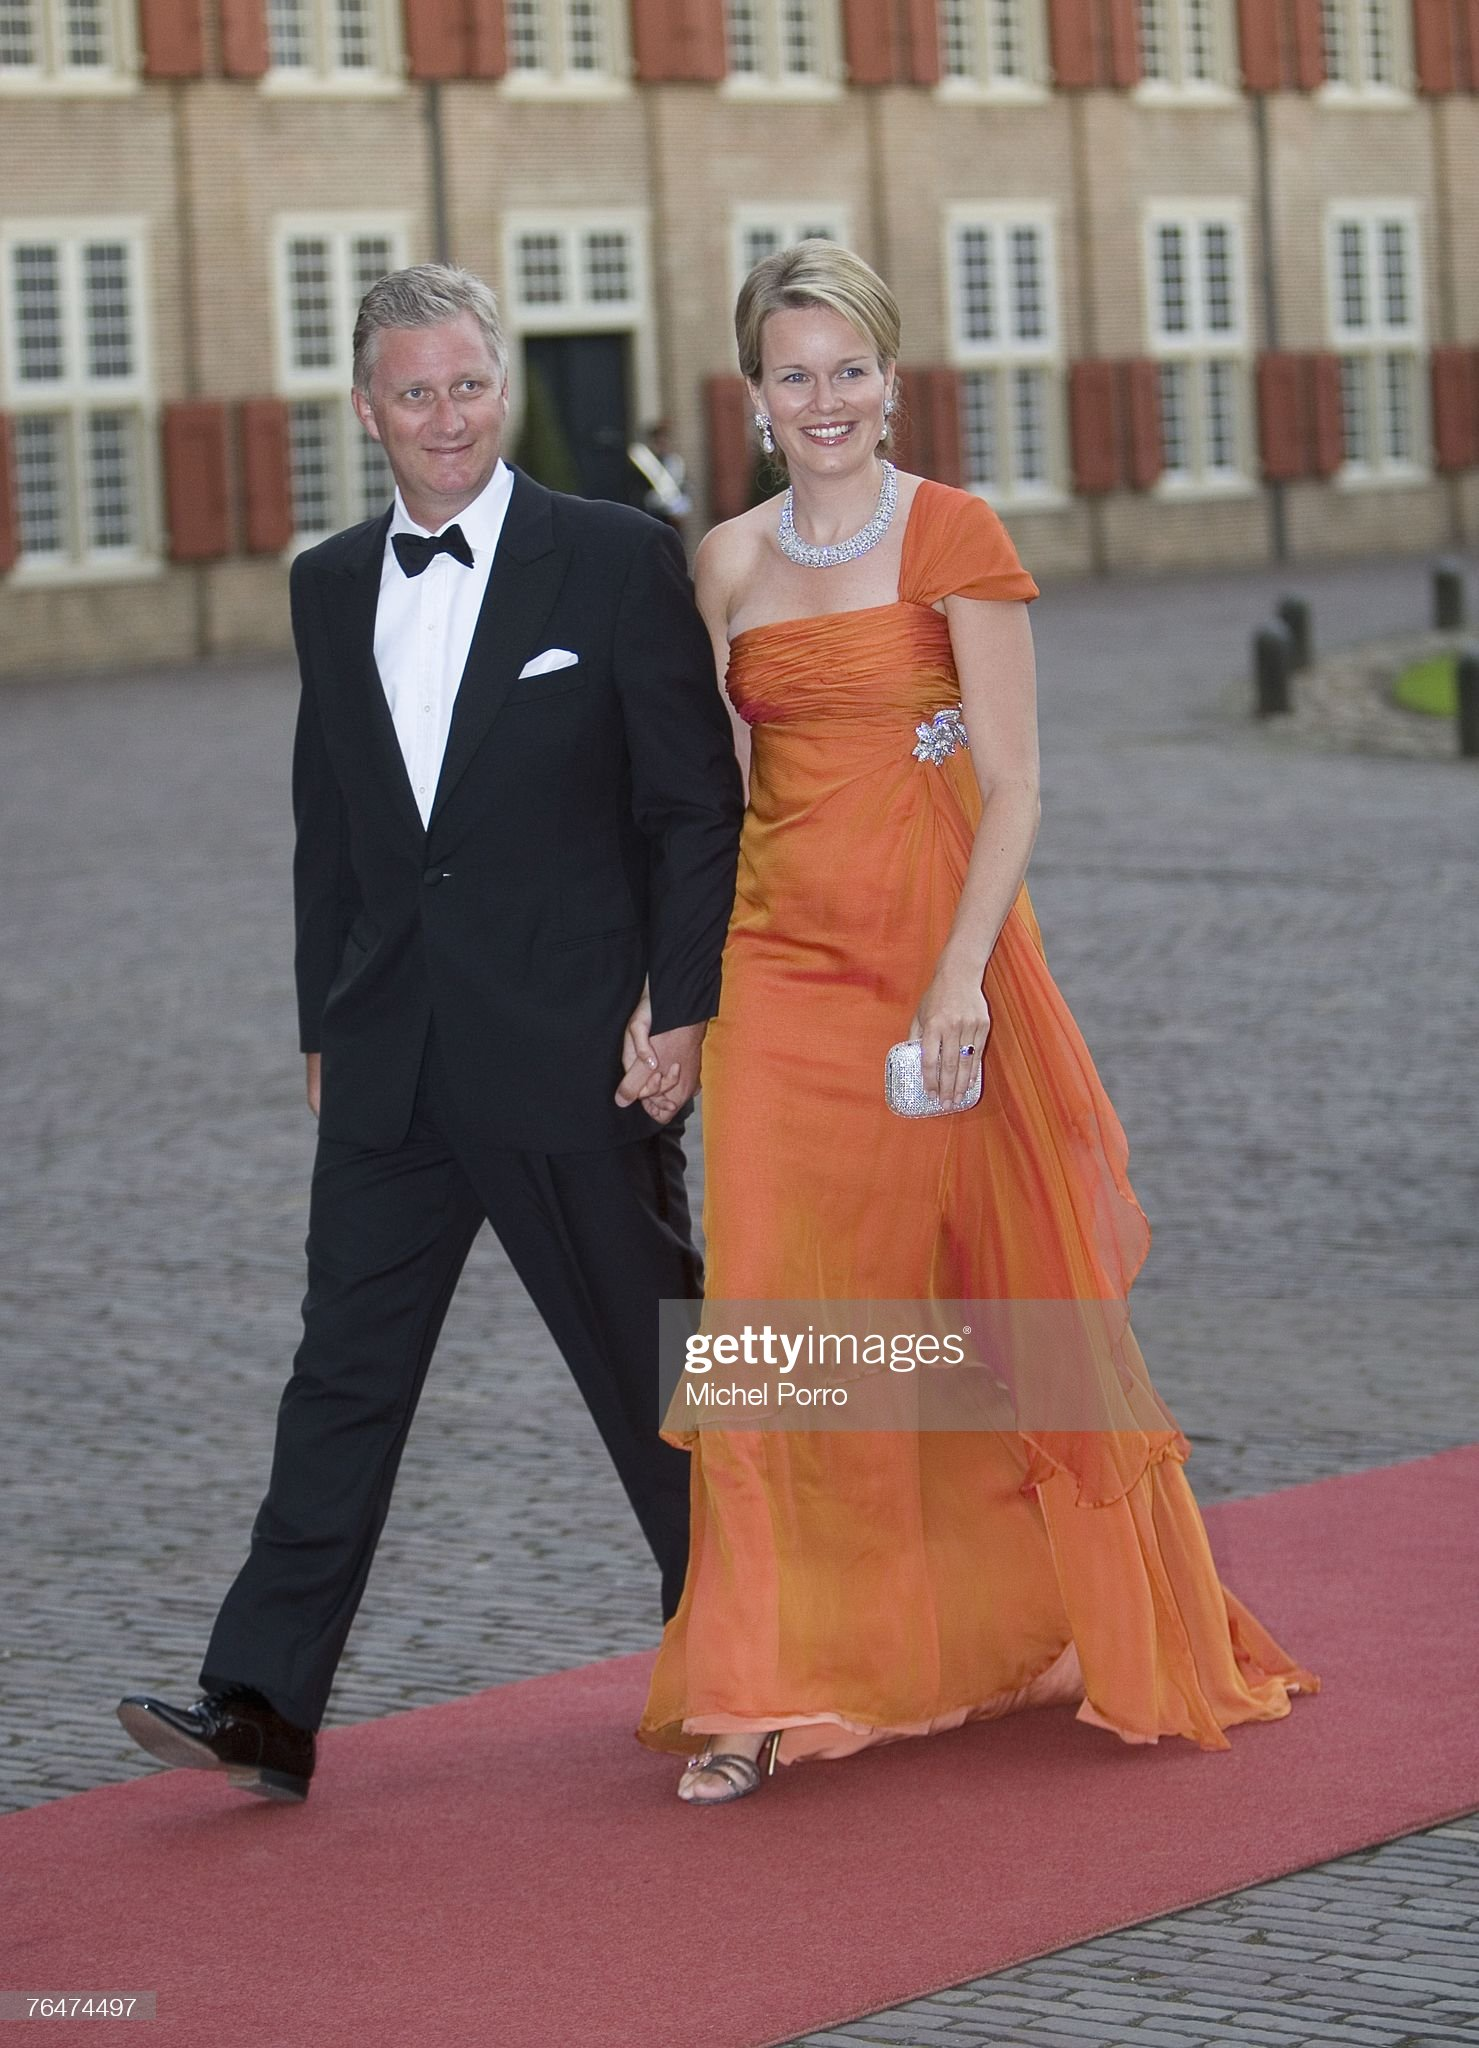 Вечерние наряды Королевы Матильды Prince Willem Alexander Of The Netherlands- 40th Birthday Party : News Photo